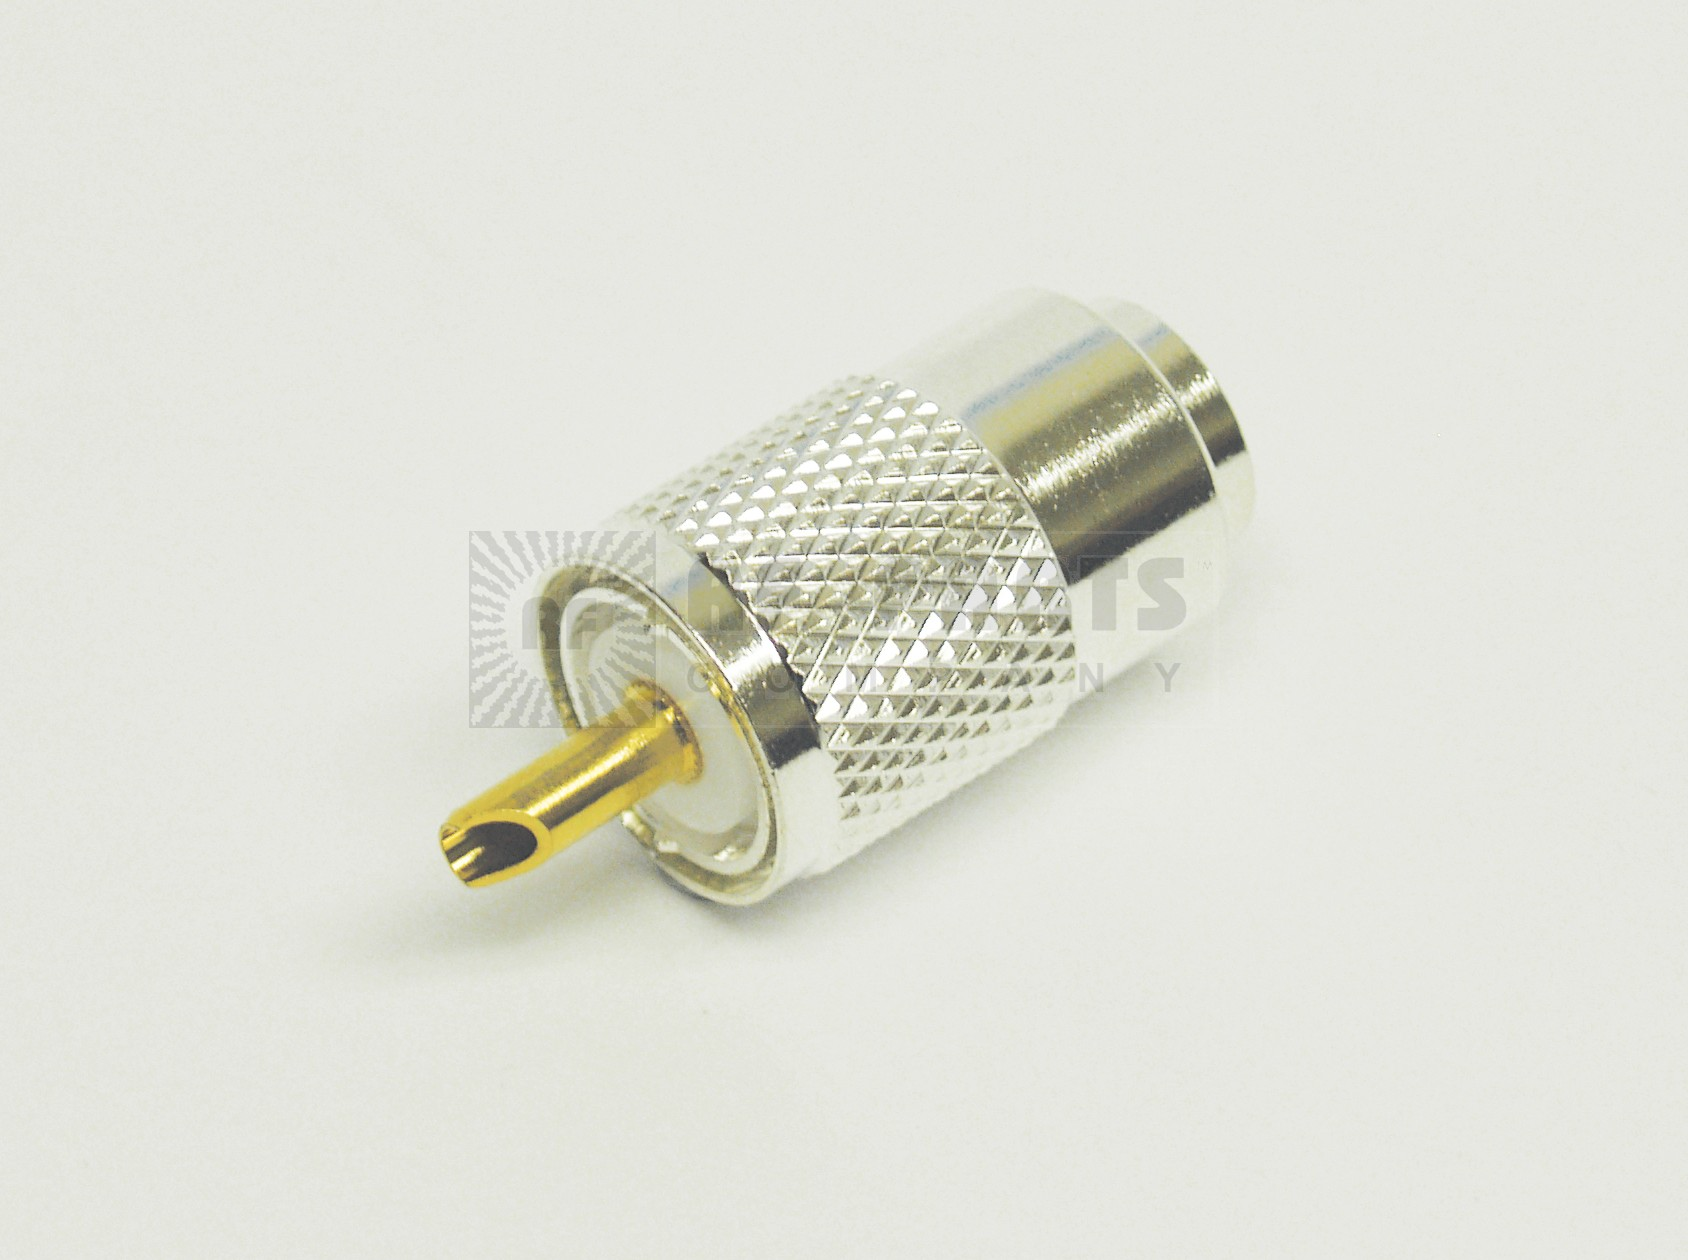 1-PL259A UHF Male Solder Type Connector, Silver/Teflon (Best Grade), LMR400/9913